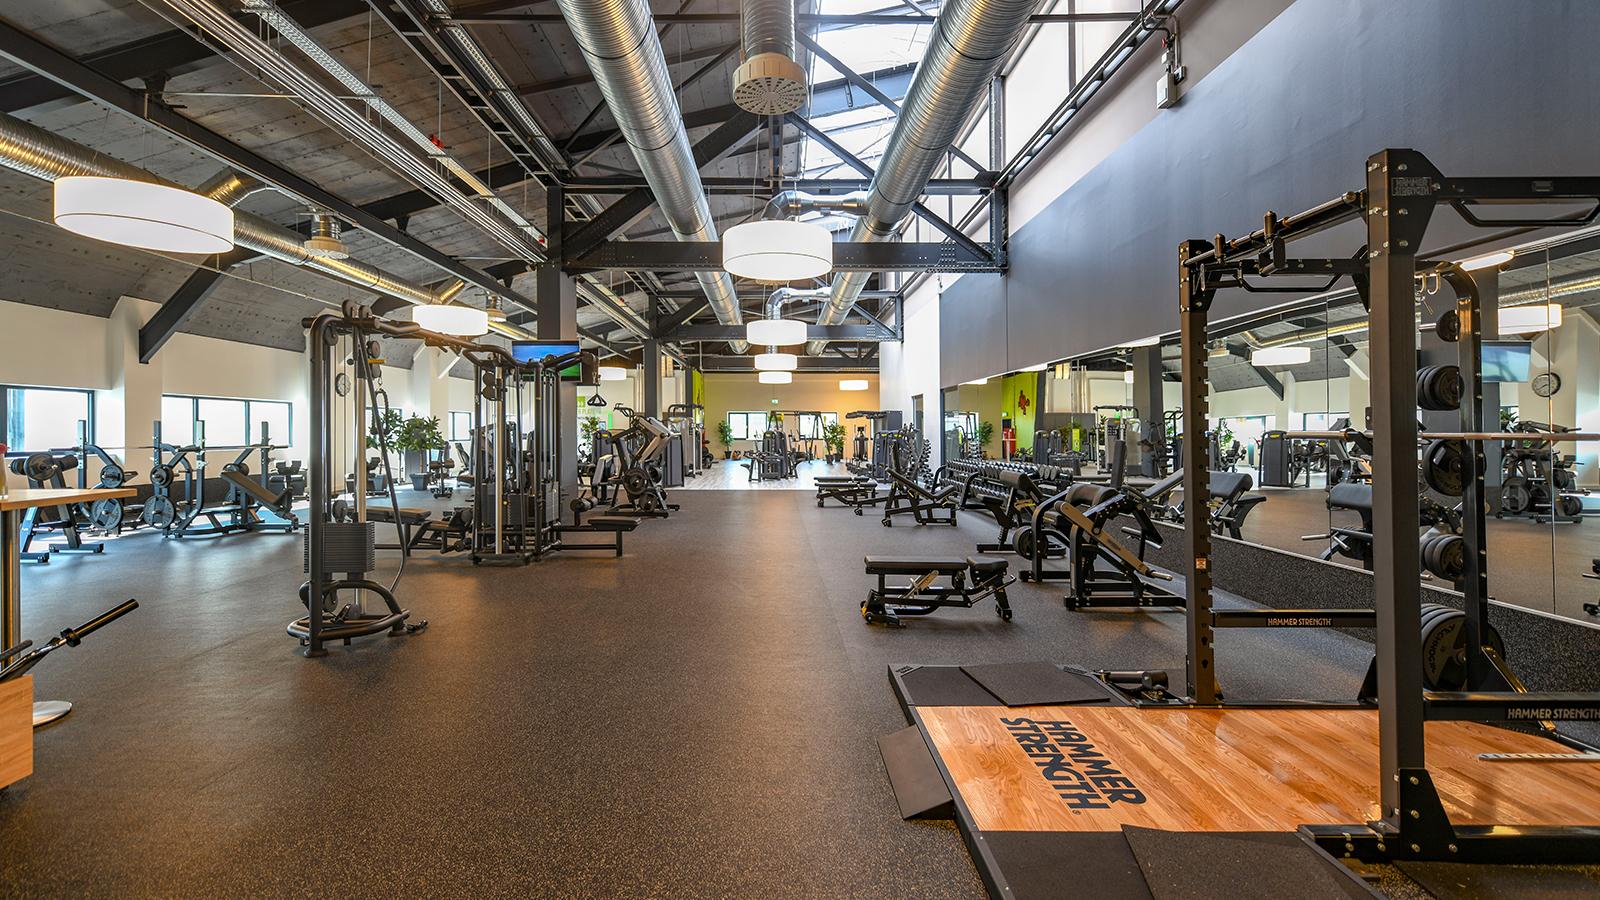 h2m-architekten-hubland-center-wuerzburg-altes-hangargebaeude-obergeschoss-fitnessstudio